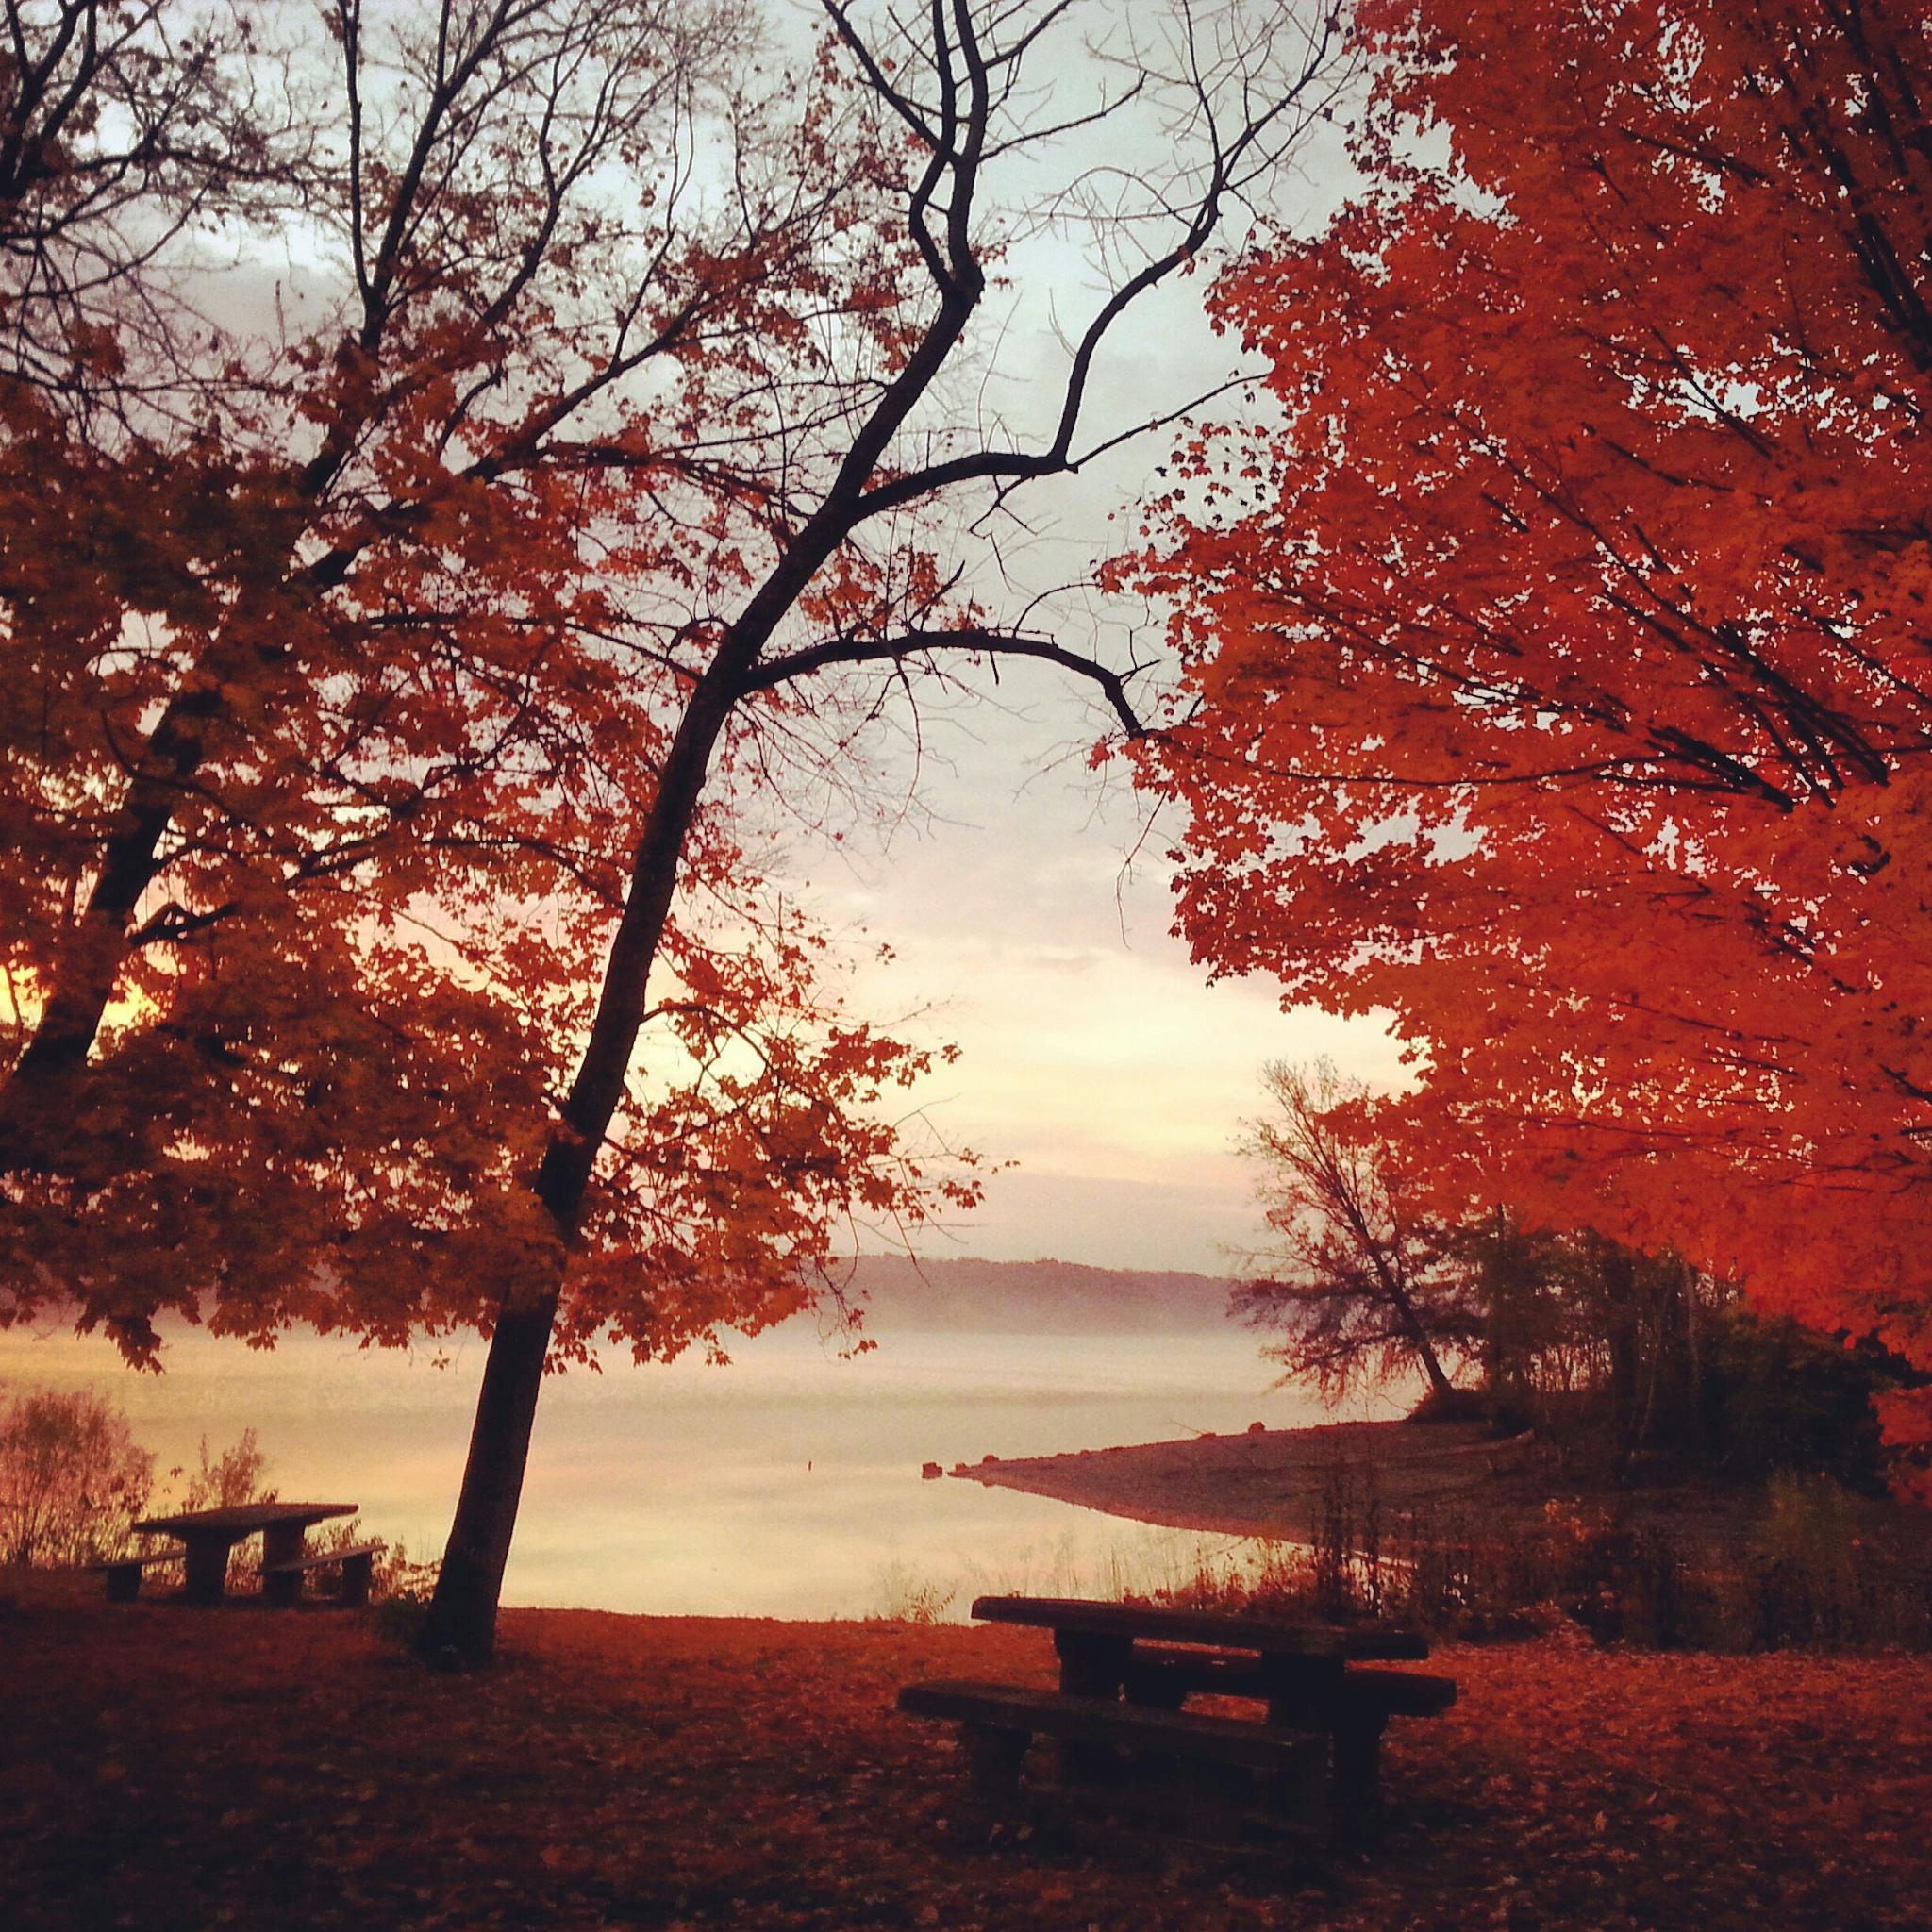 Autumn Sunrise Light shining through by livinjustly